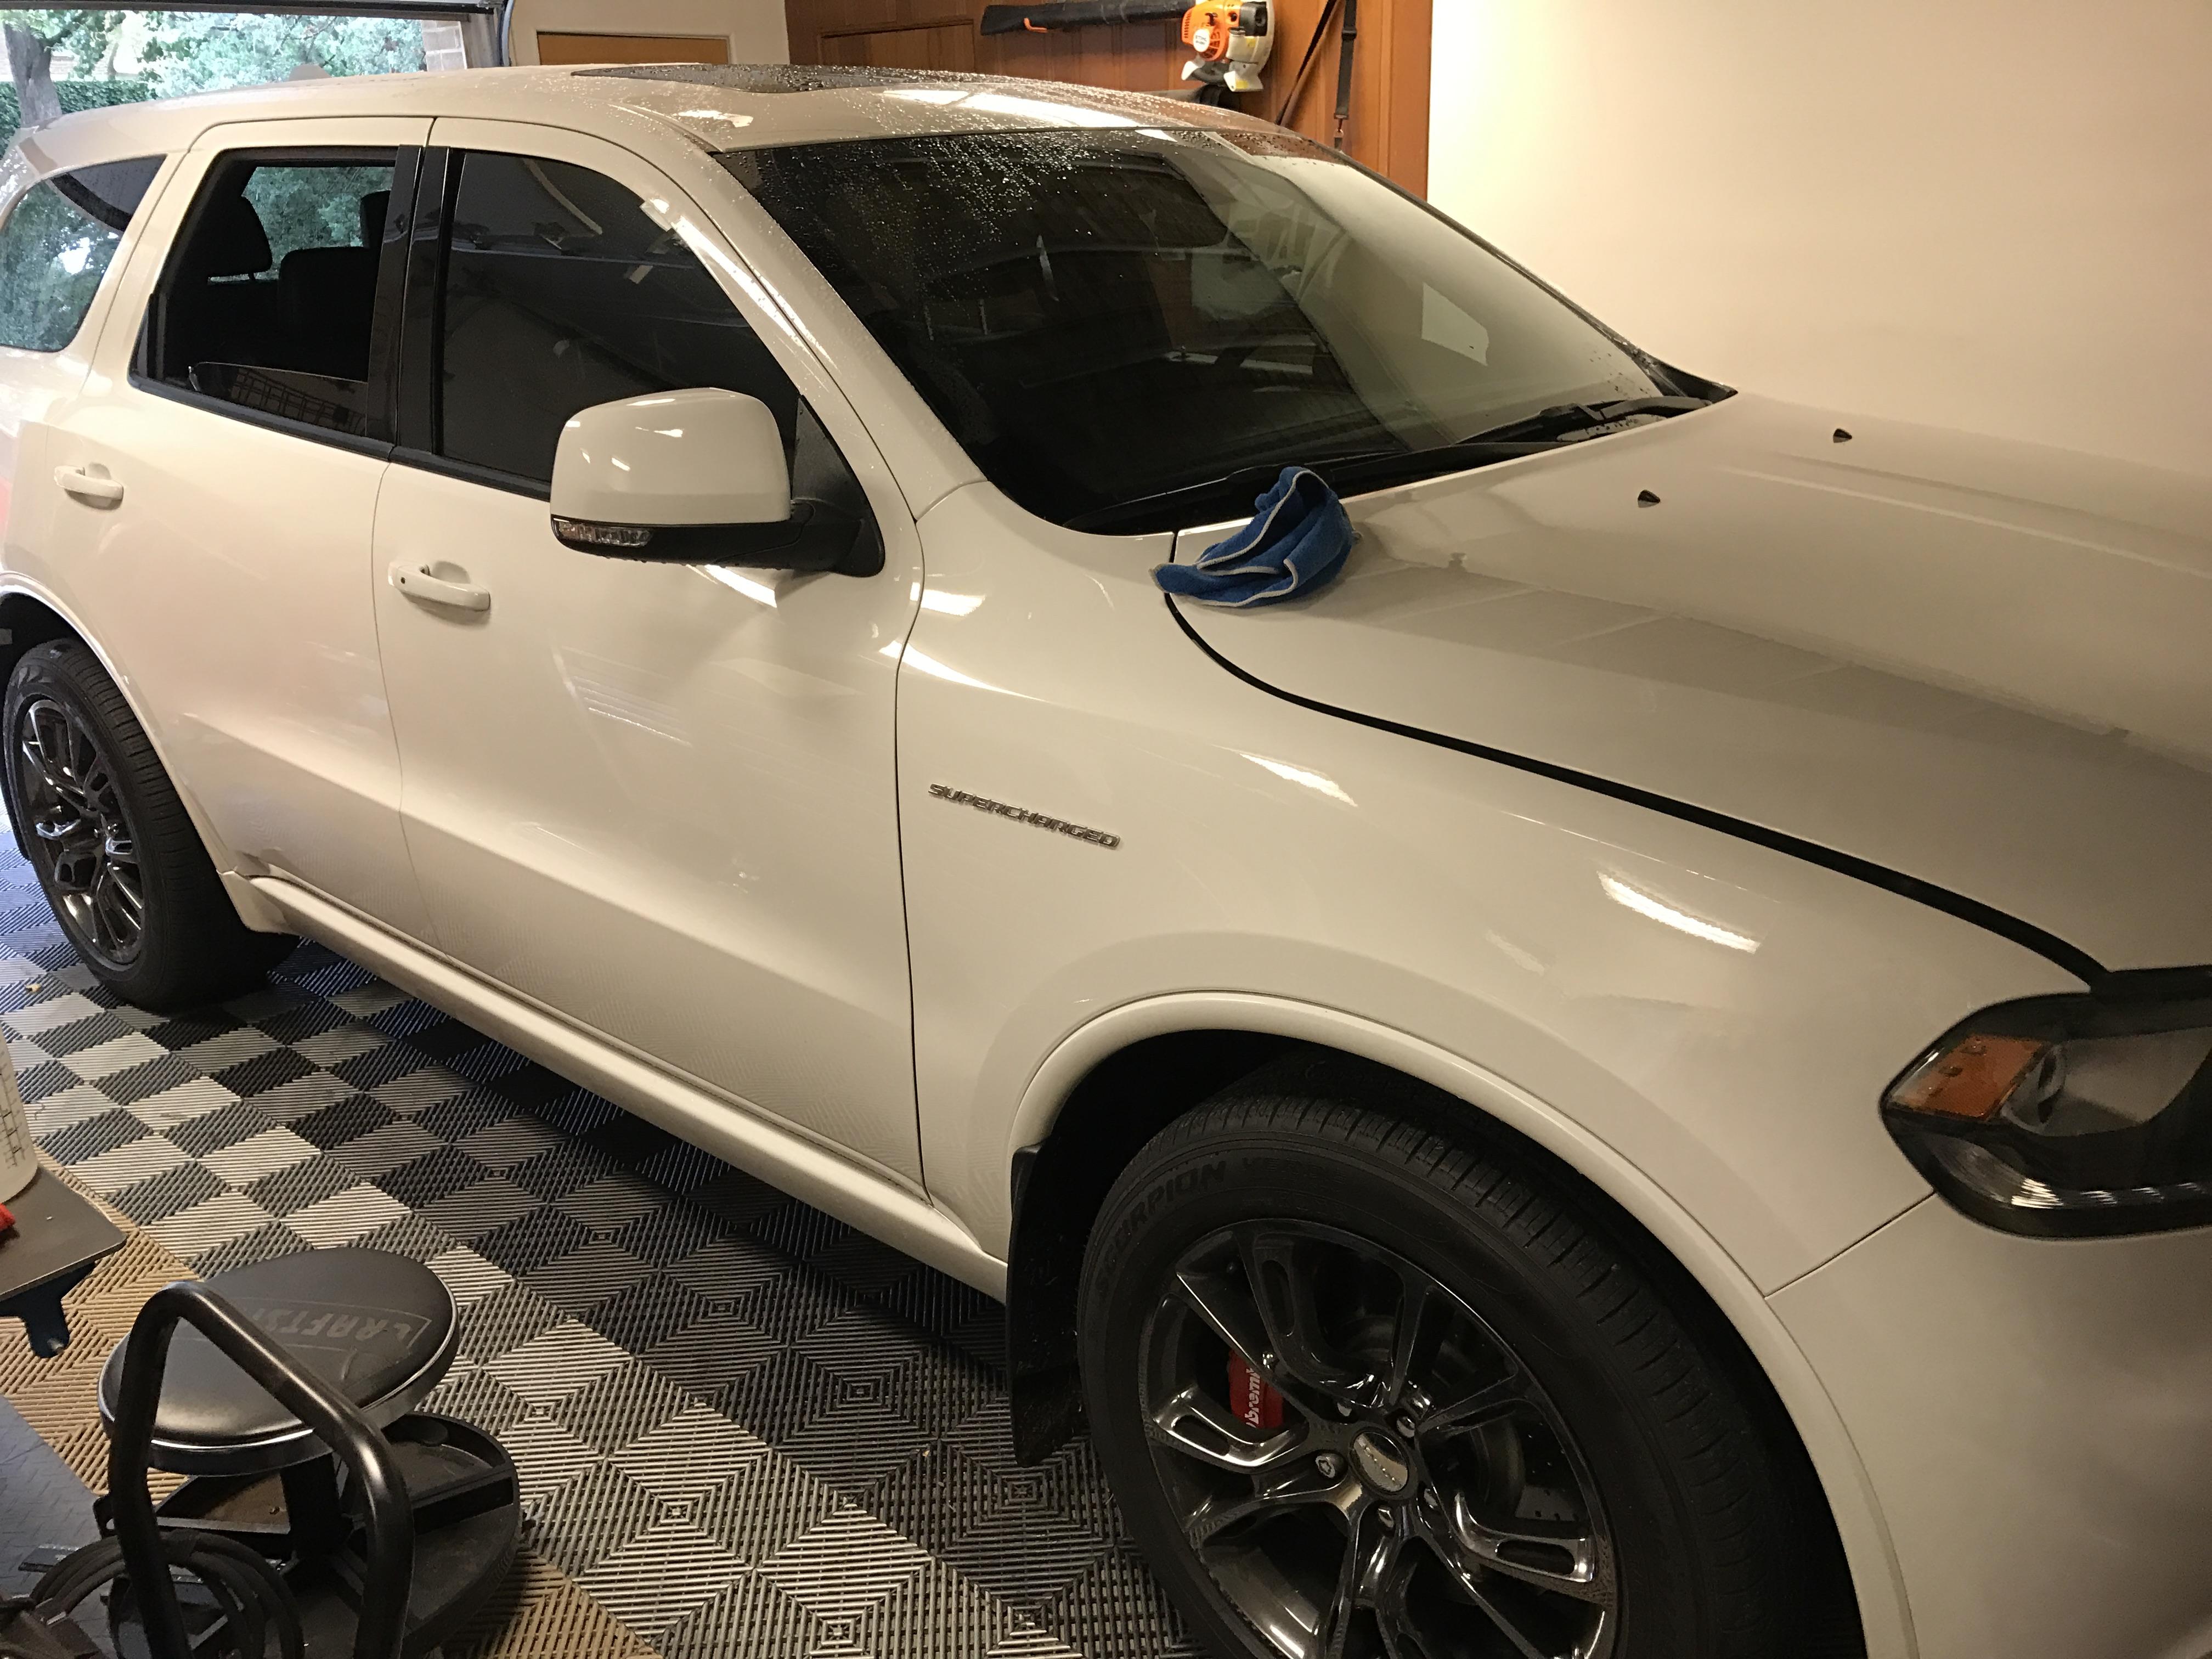 2015 Dodge Durango RT Paintless Dent Removal, Springfield IL http://217dent.com